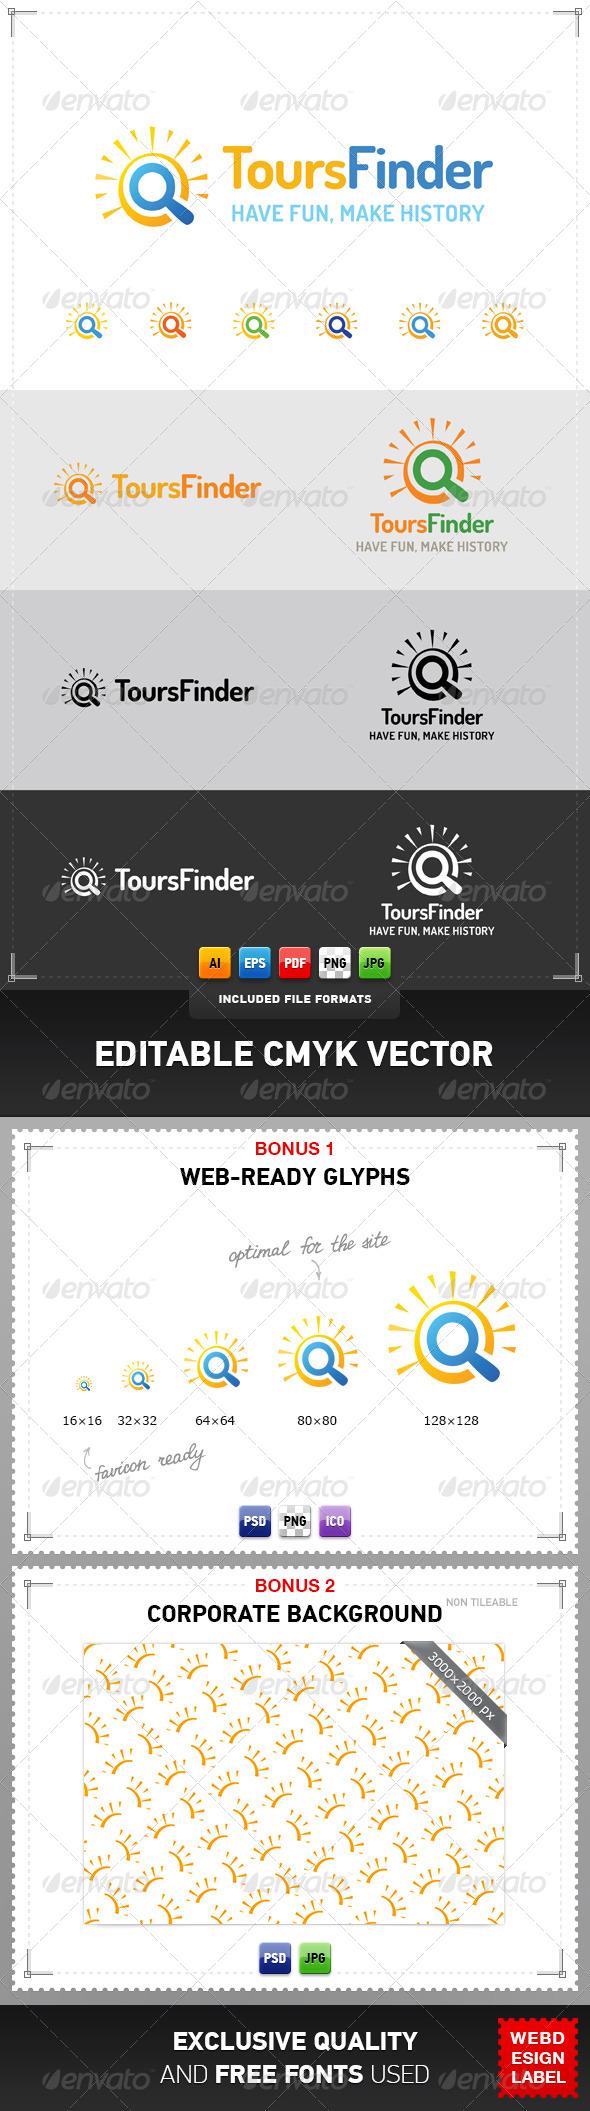 Pin By Webdesignlabel On Logos Focus Logo Travel Logo Salon Logo